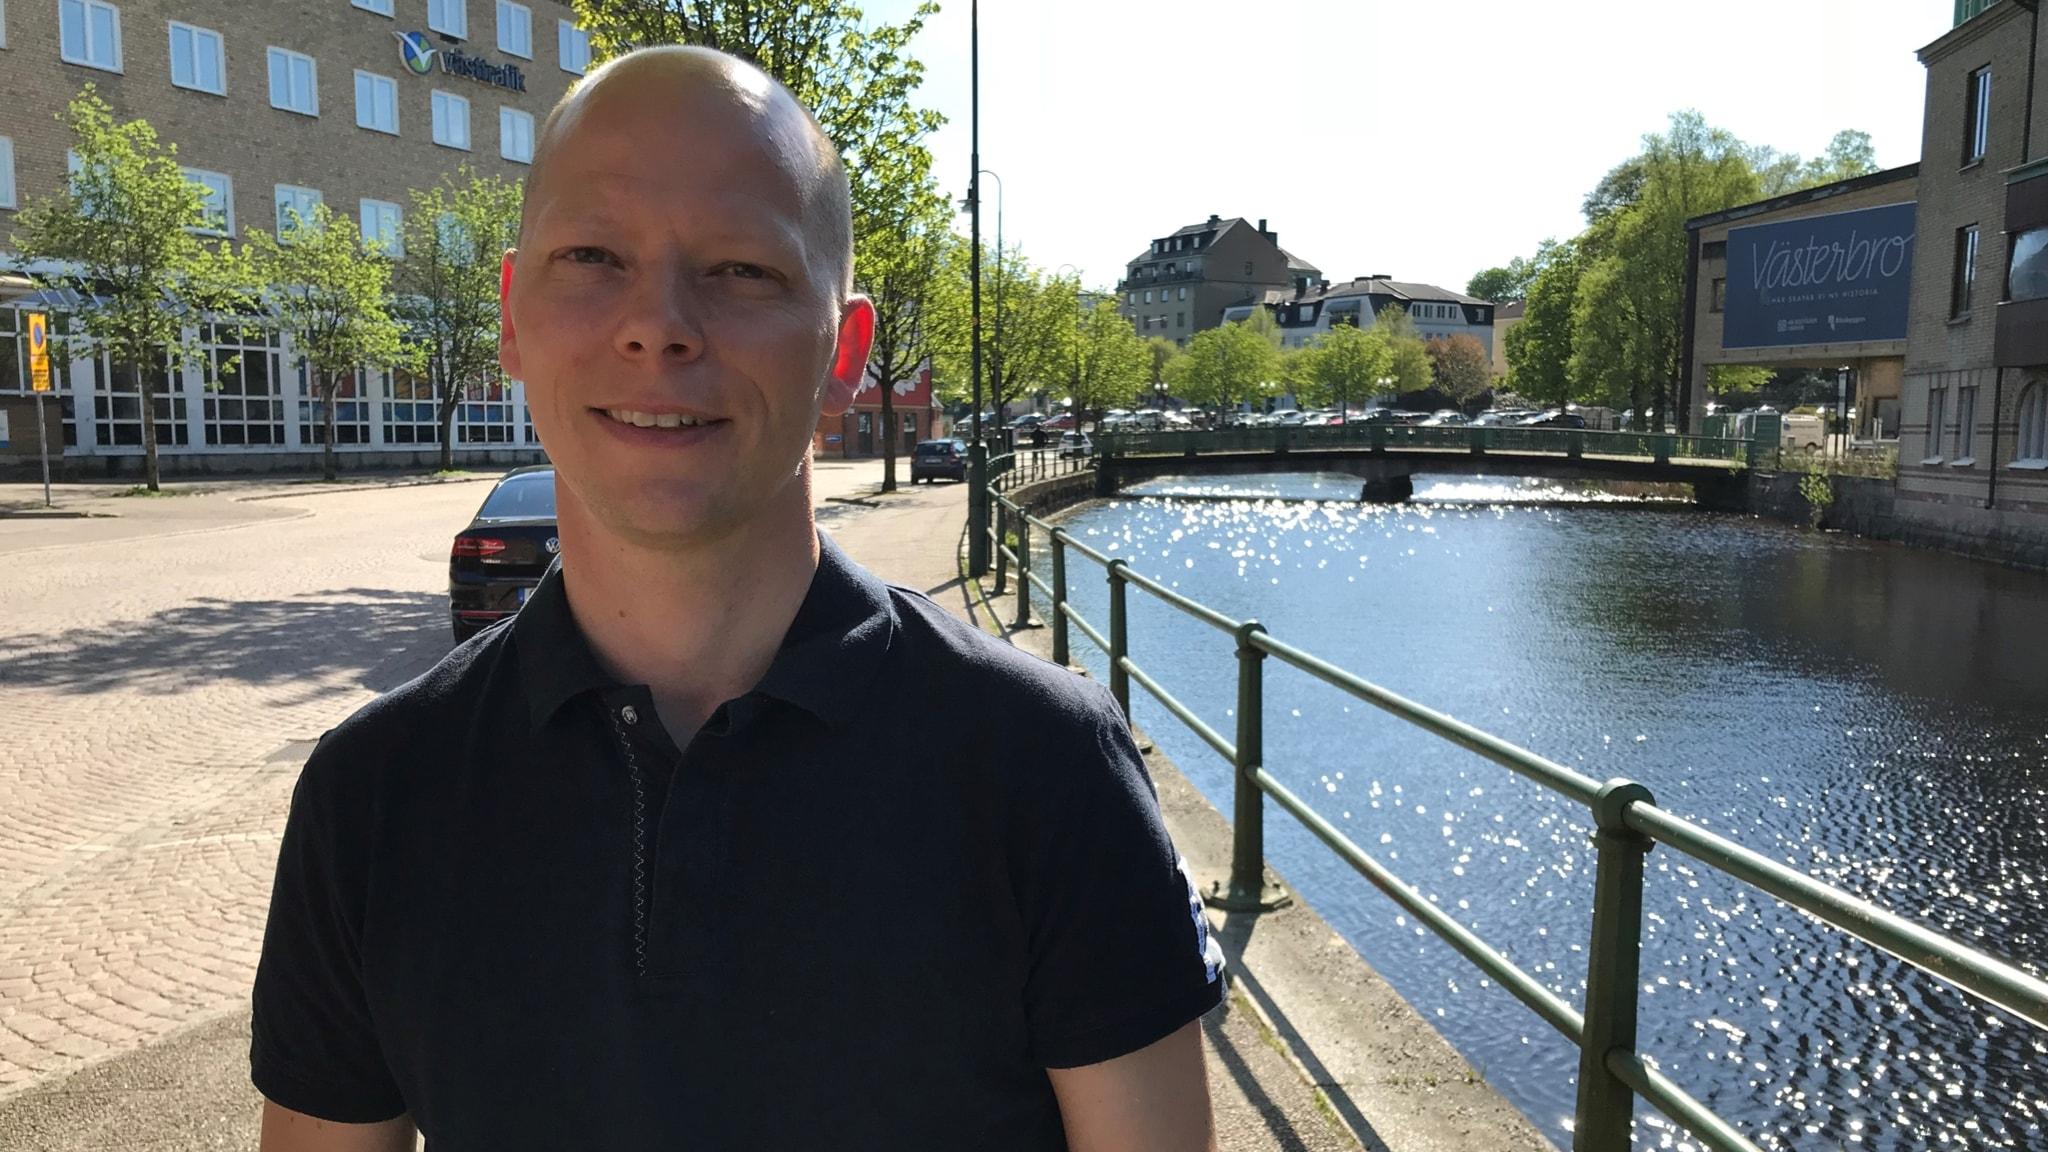 Boras Swimrun Karta.Boras City Swimrun Tillbaka I Sommar P4 Sjuharad Sveriges Radio